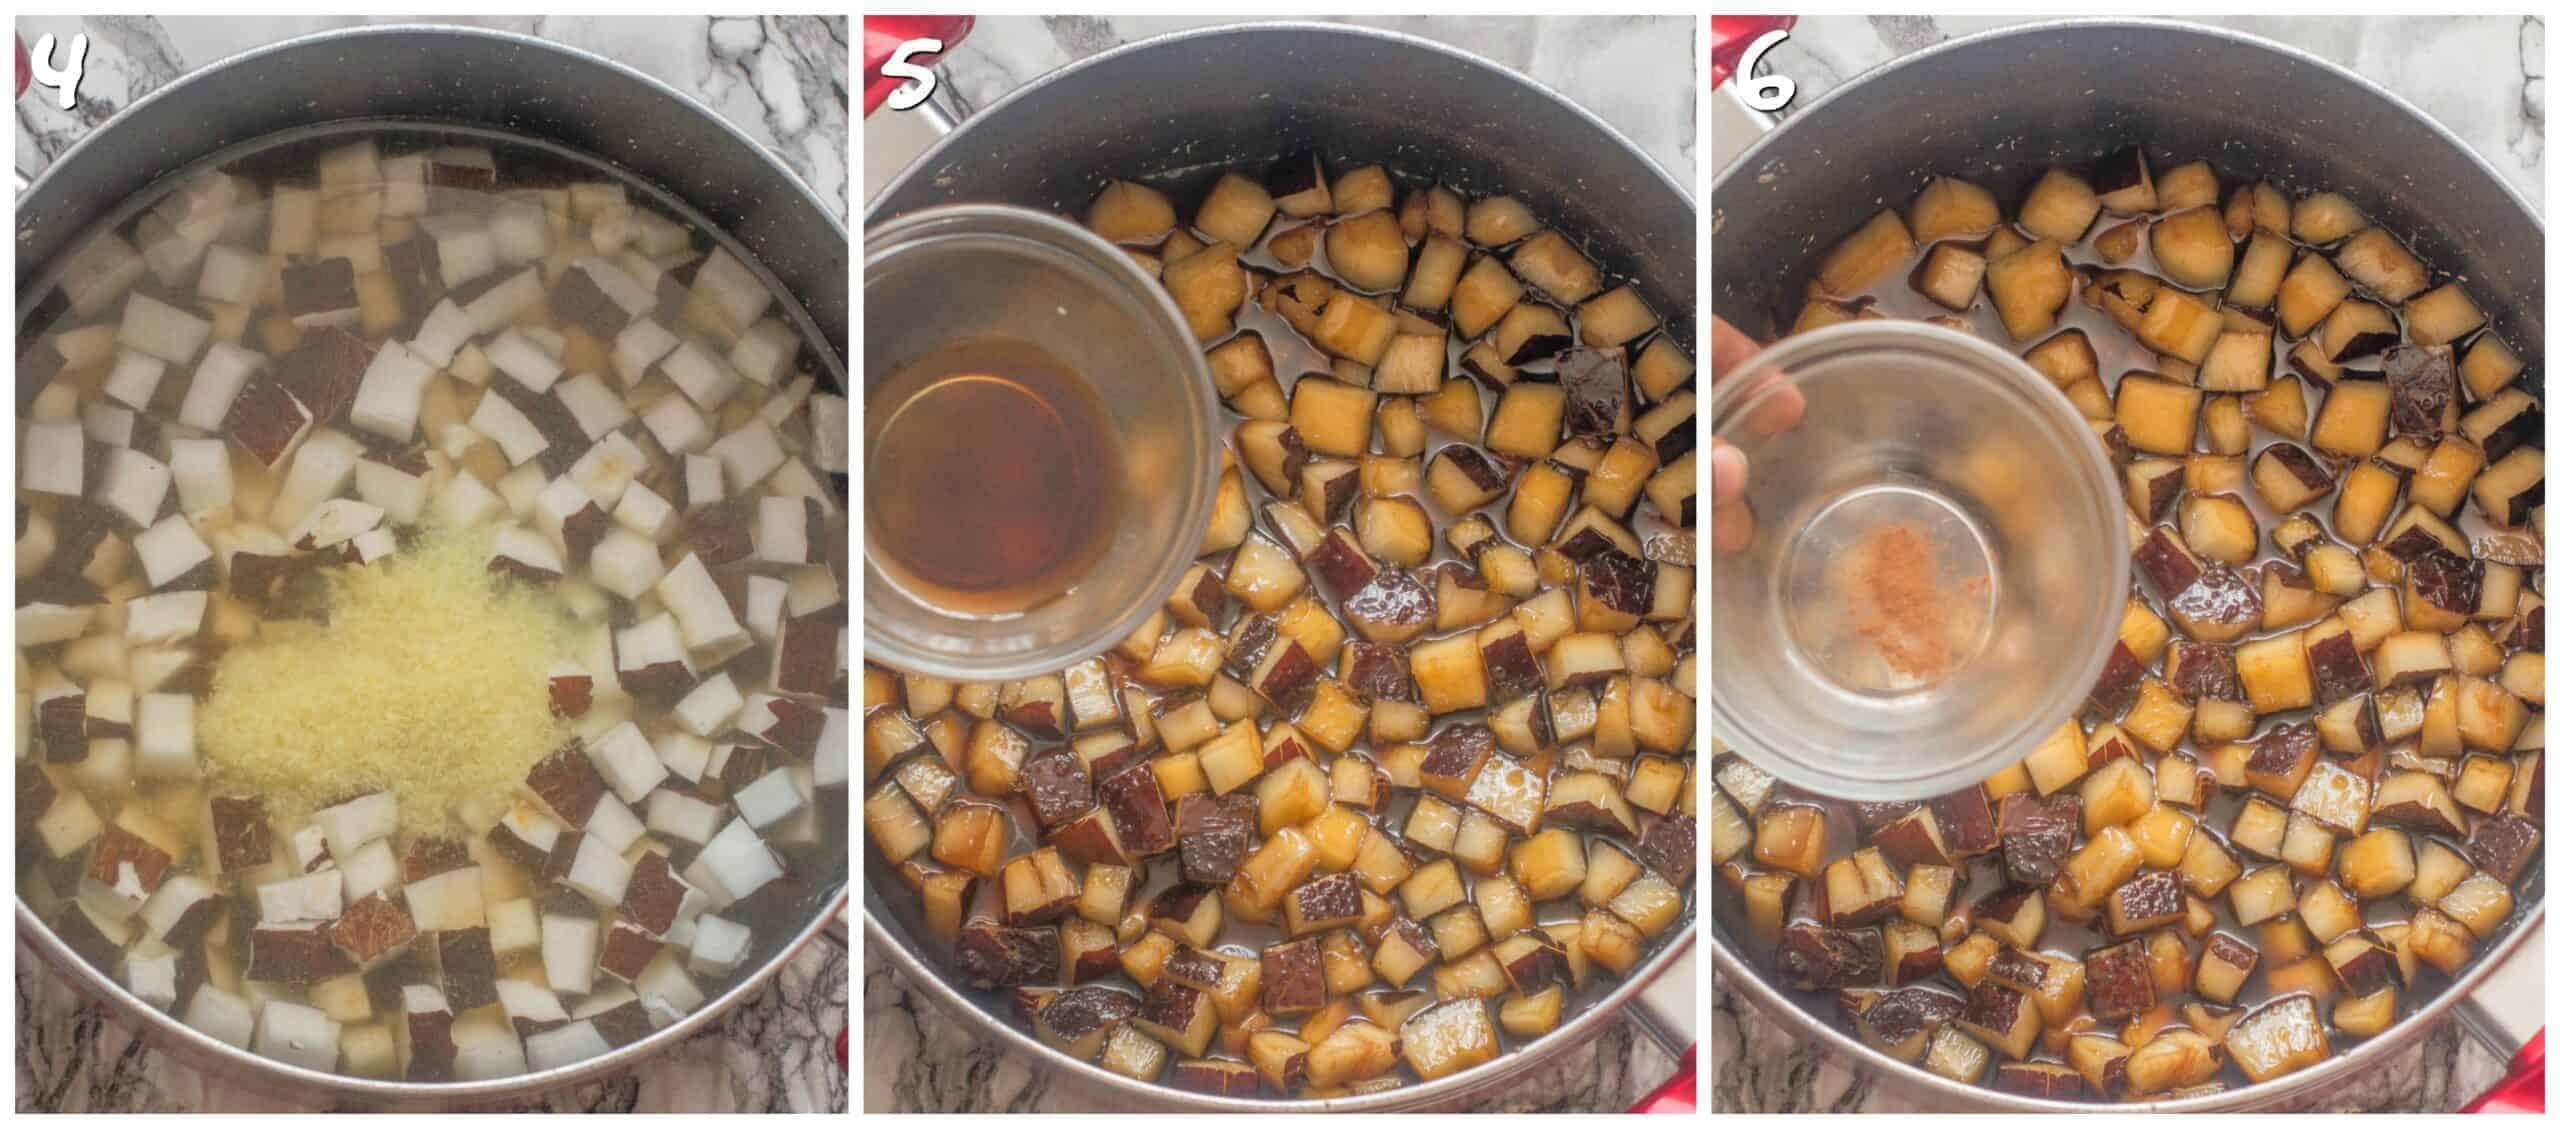 steps 4-6 ginger, vanilla, cinnamon and pink salt added